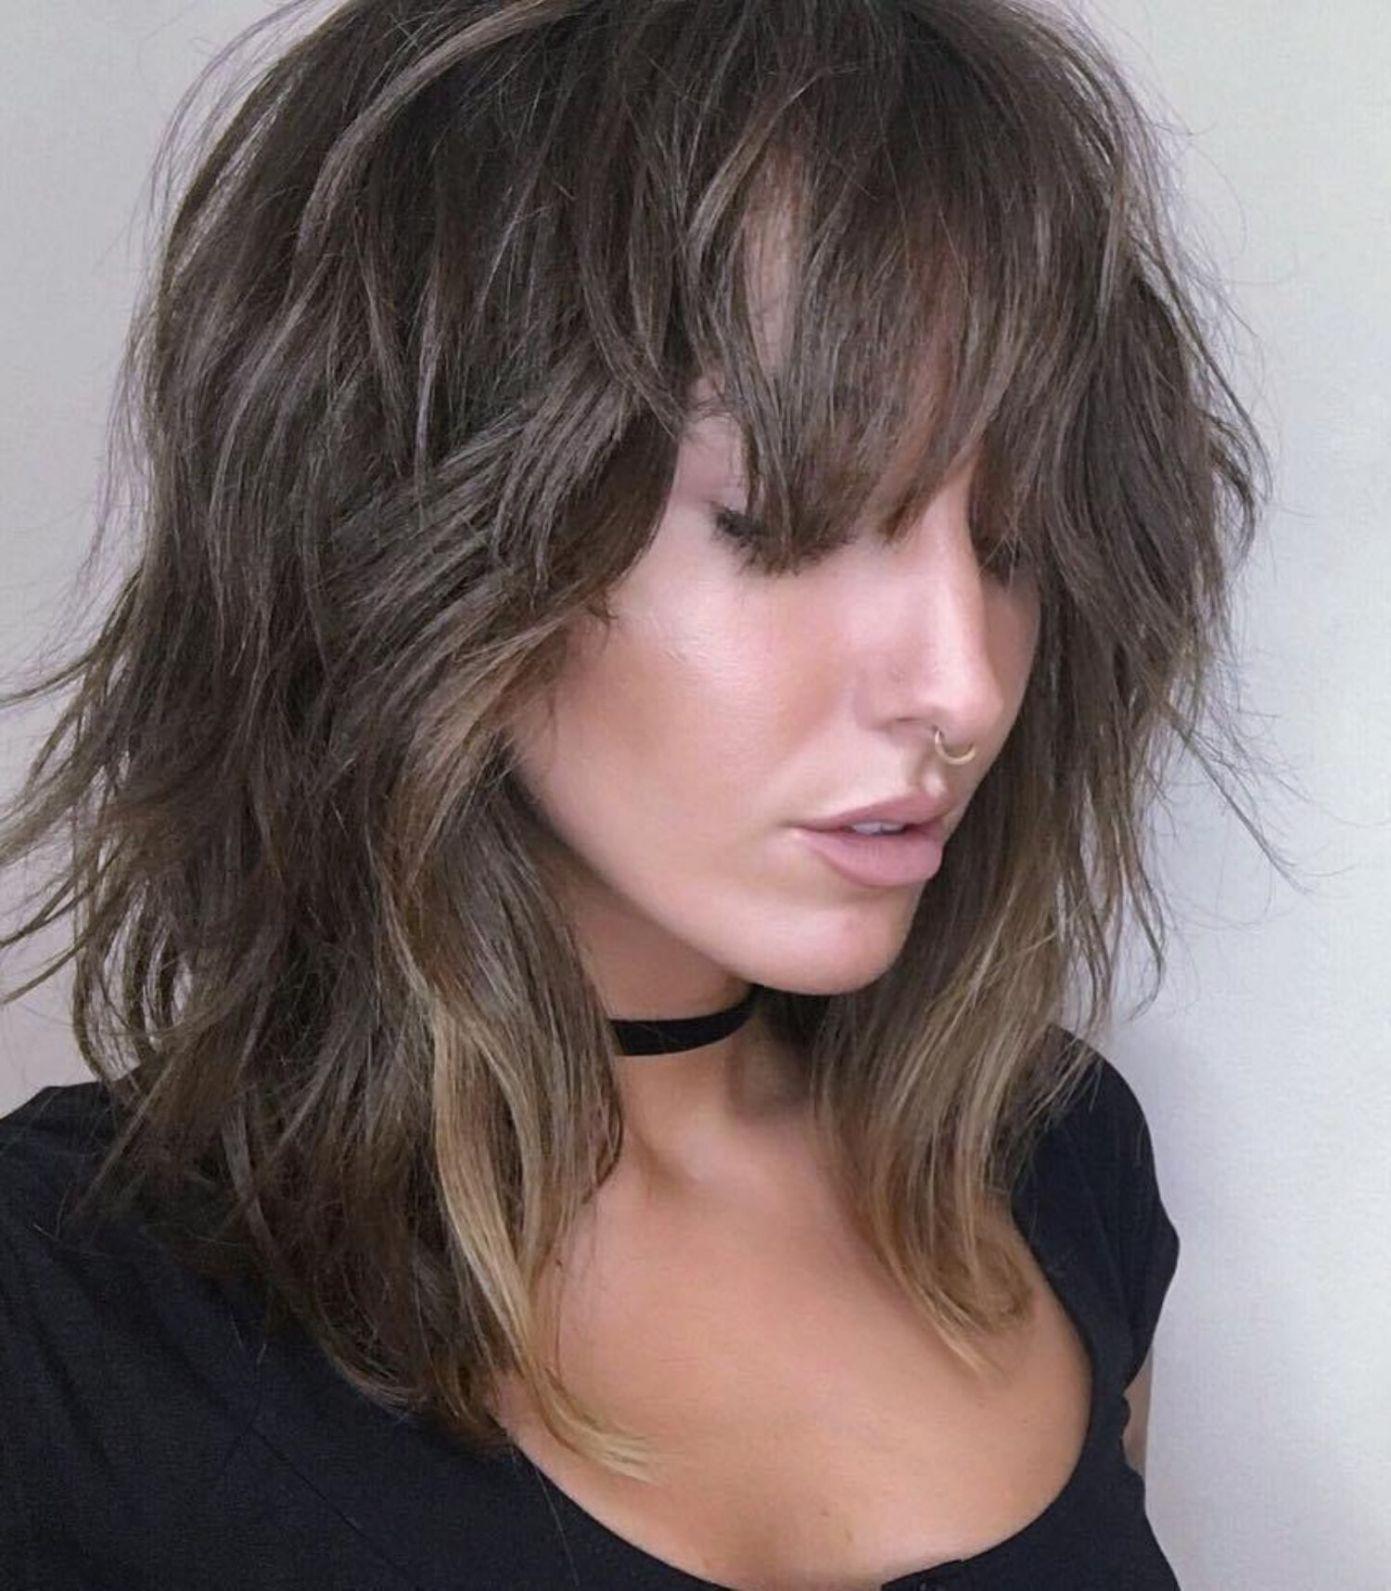 70 Best Variations Of A Medium Shag Haircut For Your Distinctive Style Modern Shag Haircut Medium Shag Haircuts Medium Length Hair Styles